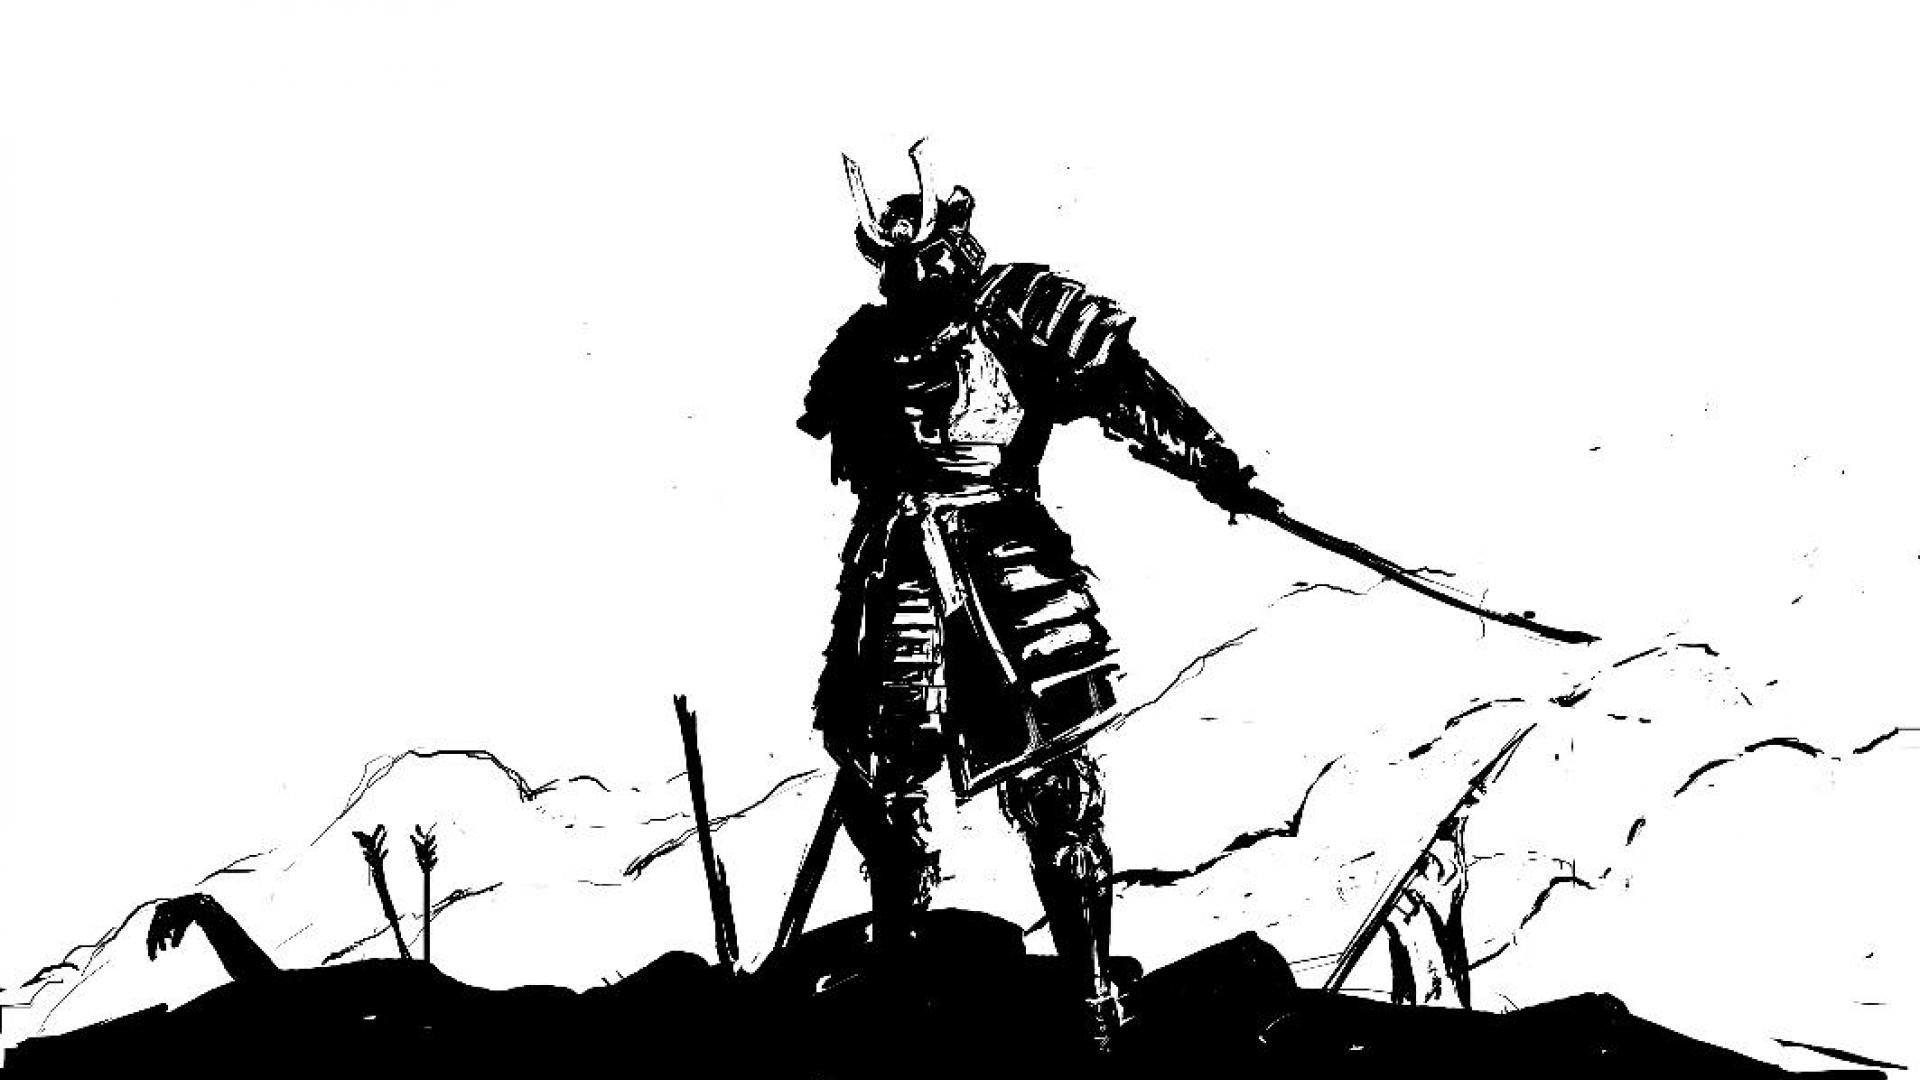 Samurai Wallpaper Dump